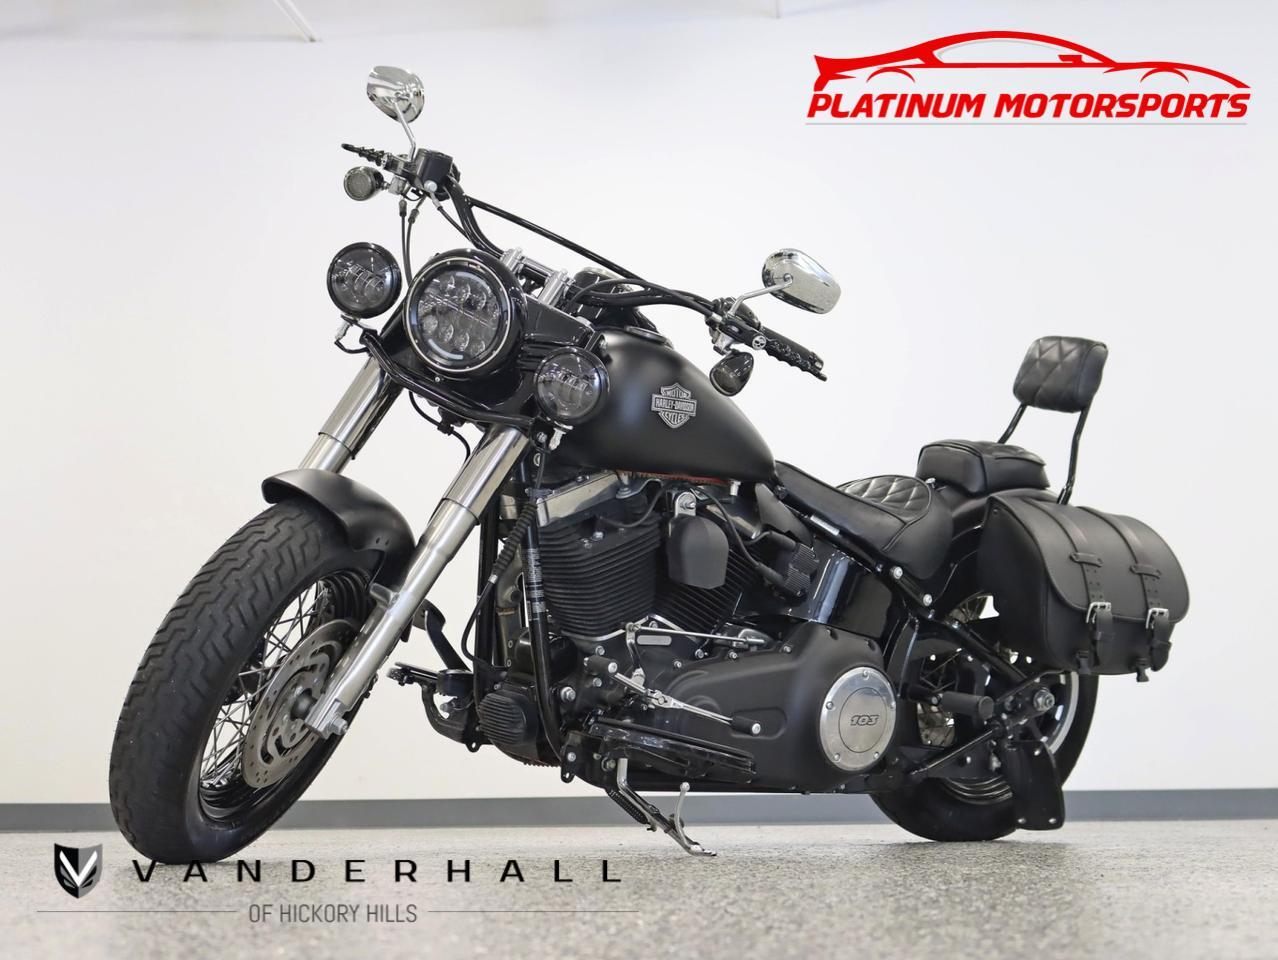 2012 Harley Davidson SOFTAIL SLIM (FLS 103) Hickory Hills IL